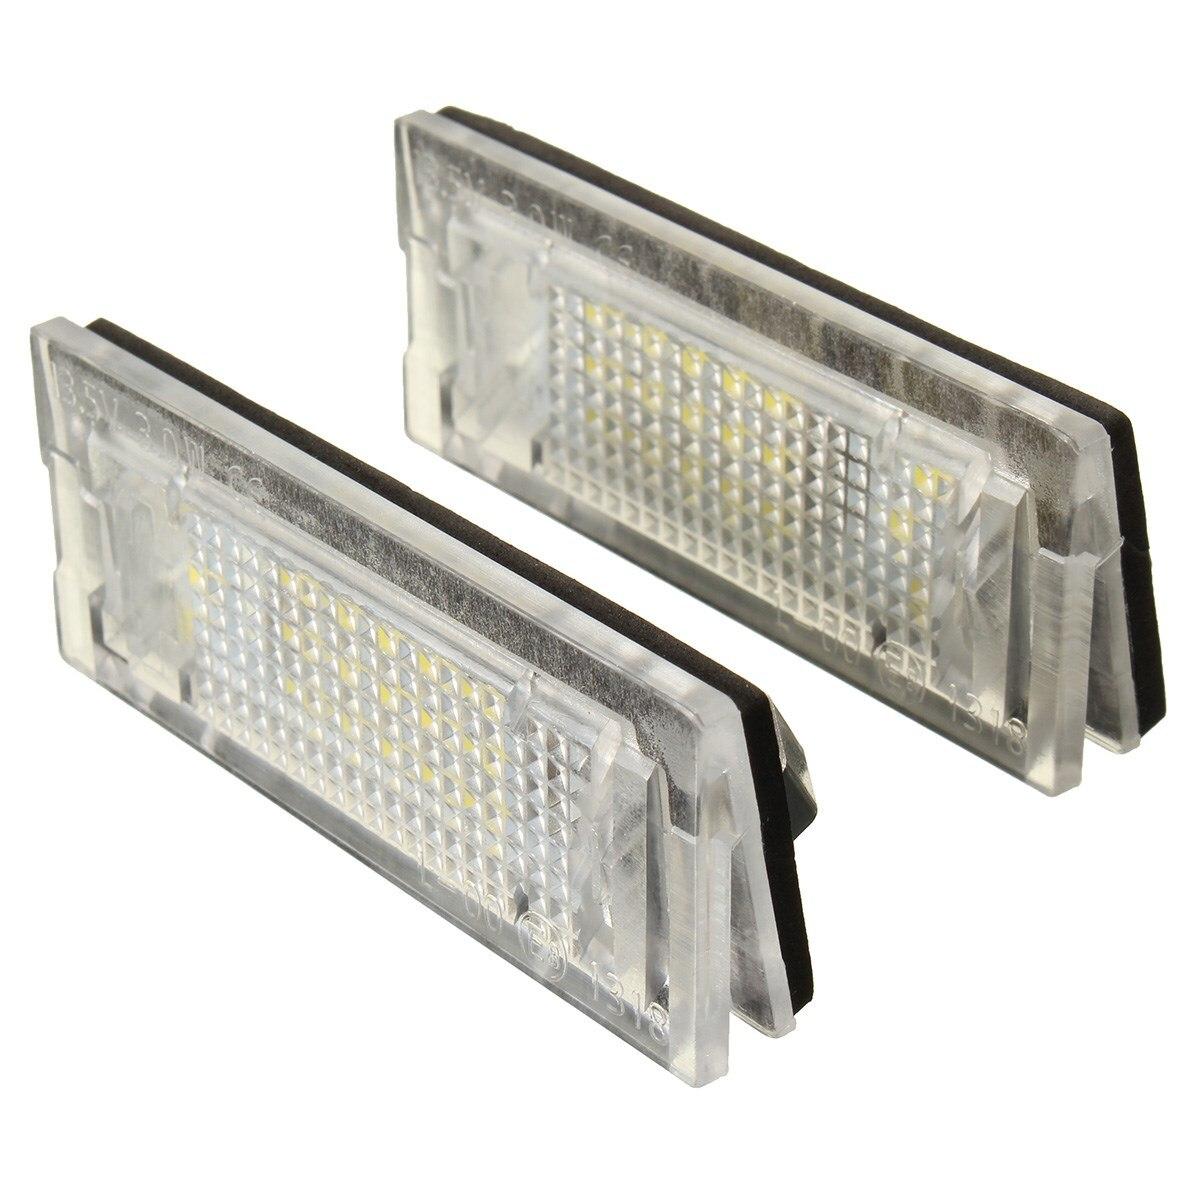 2x White LED Number License Plate Lights font b Lamp b font Fit For BMW E46